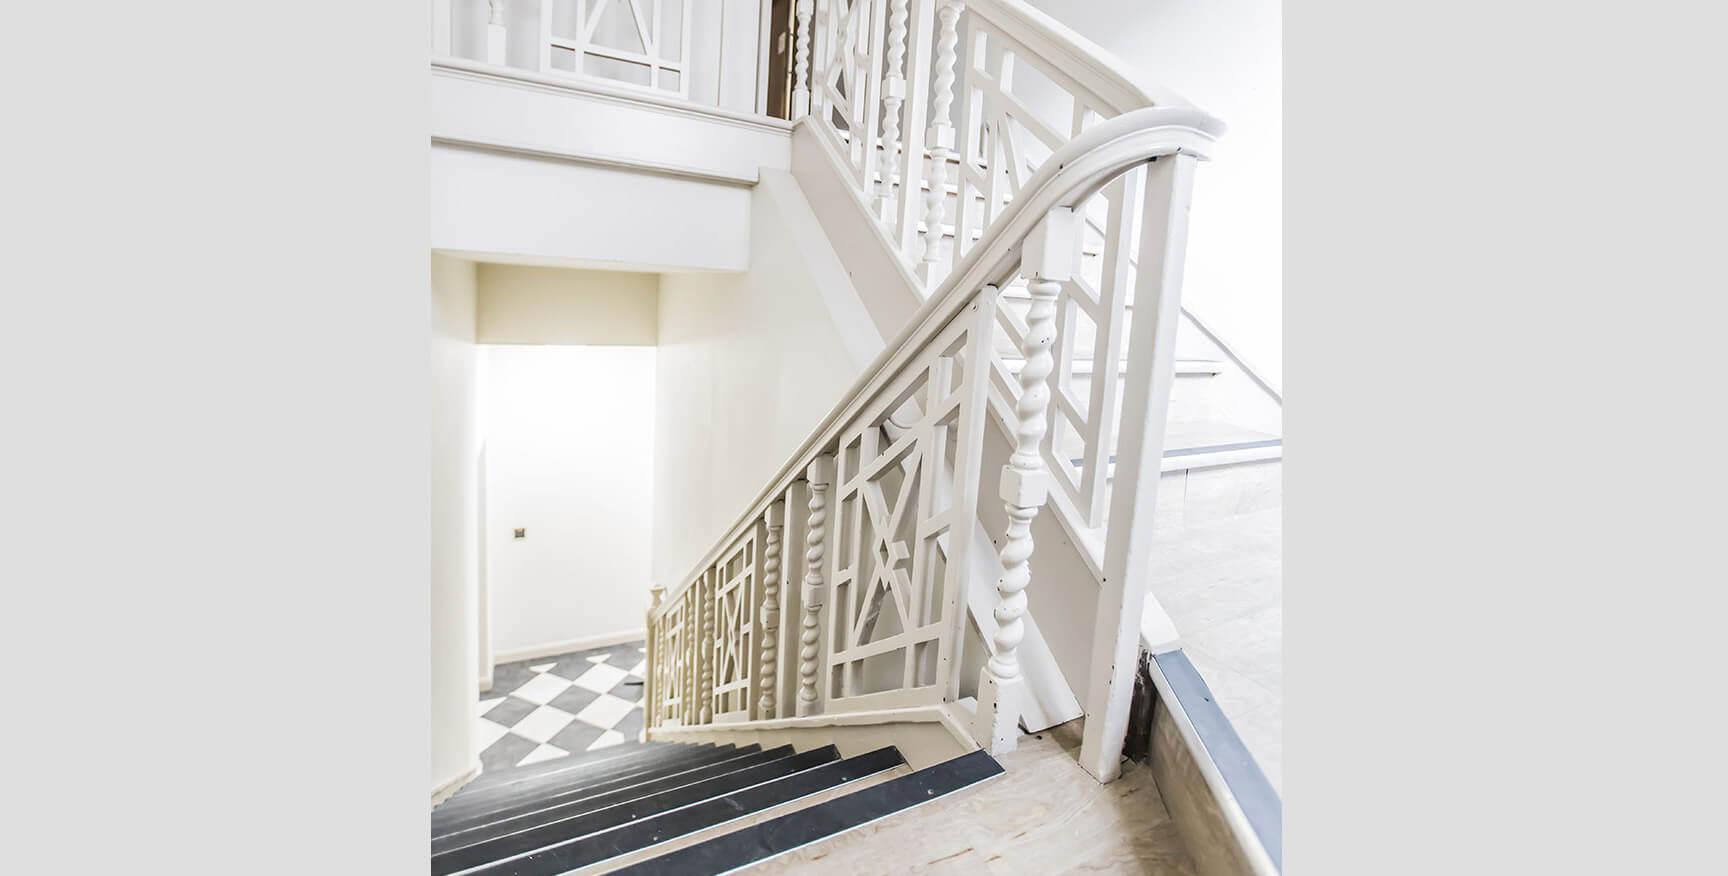 Alexandra House - Luxury Student Accommodation Sheffield (internal view of staircase)